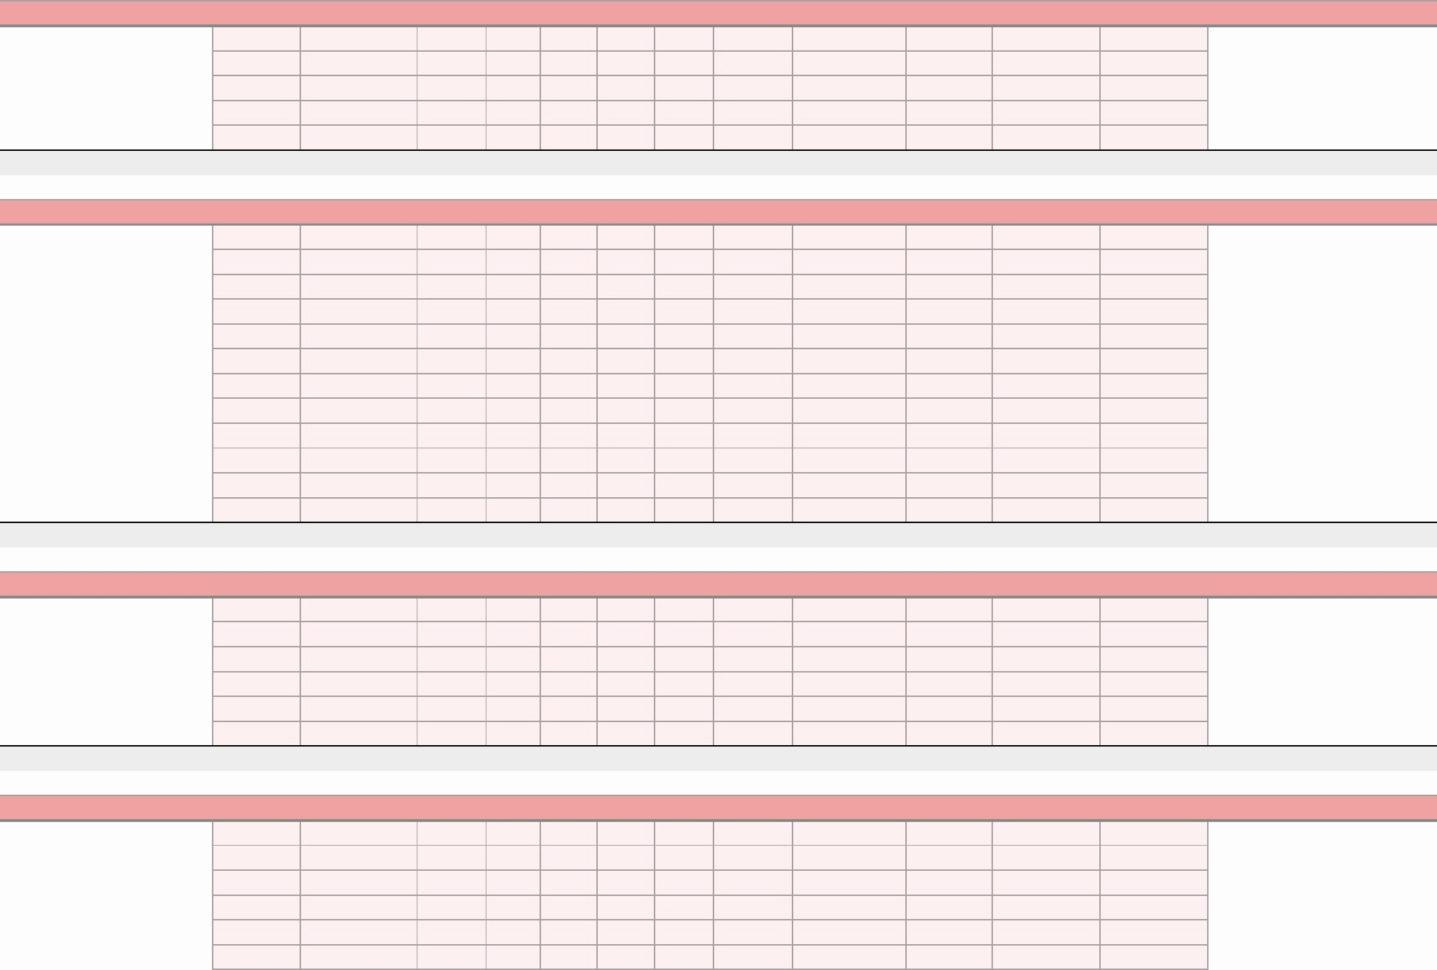 Dave Ramsey Budget Spreadsheet Spreadshee Dave